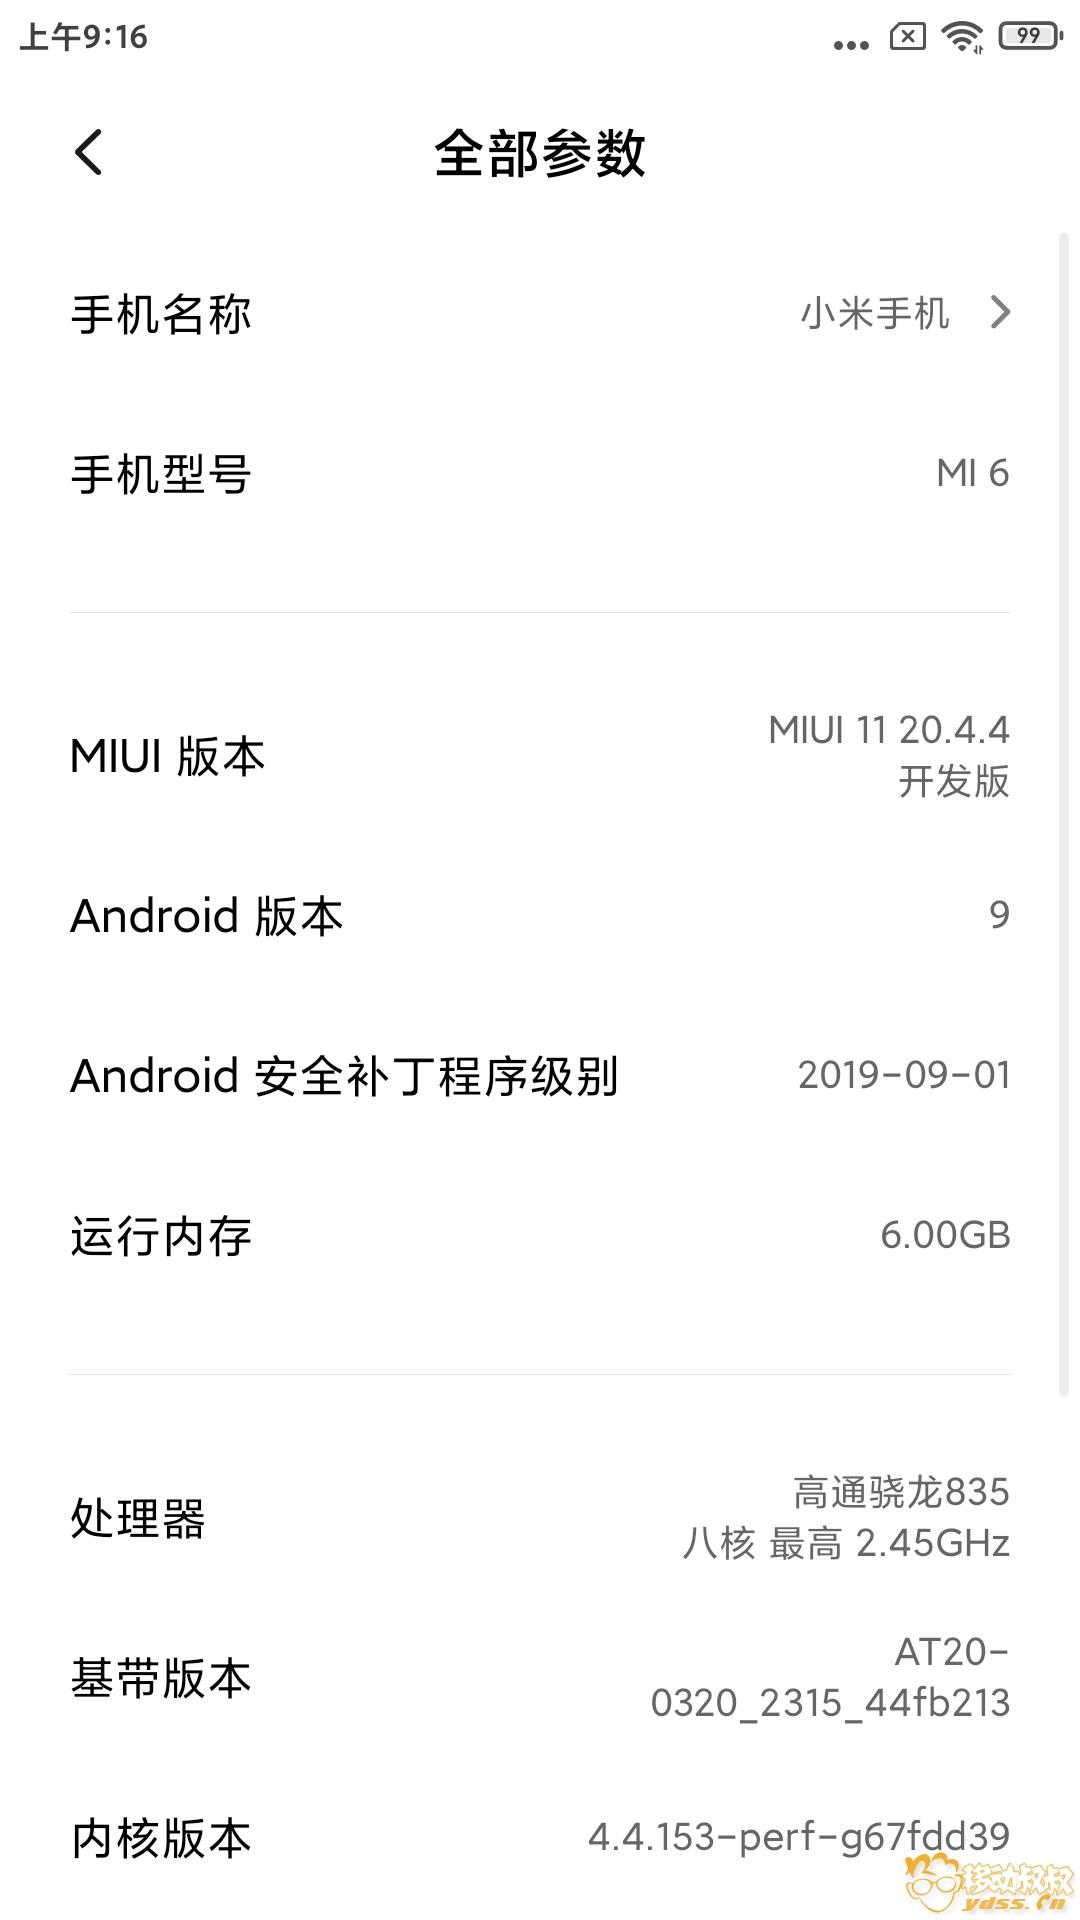 Screenshot_2020-04-04-09-16-58-131_com.android.settings.jpg